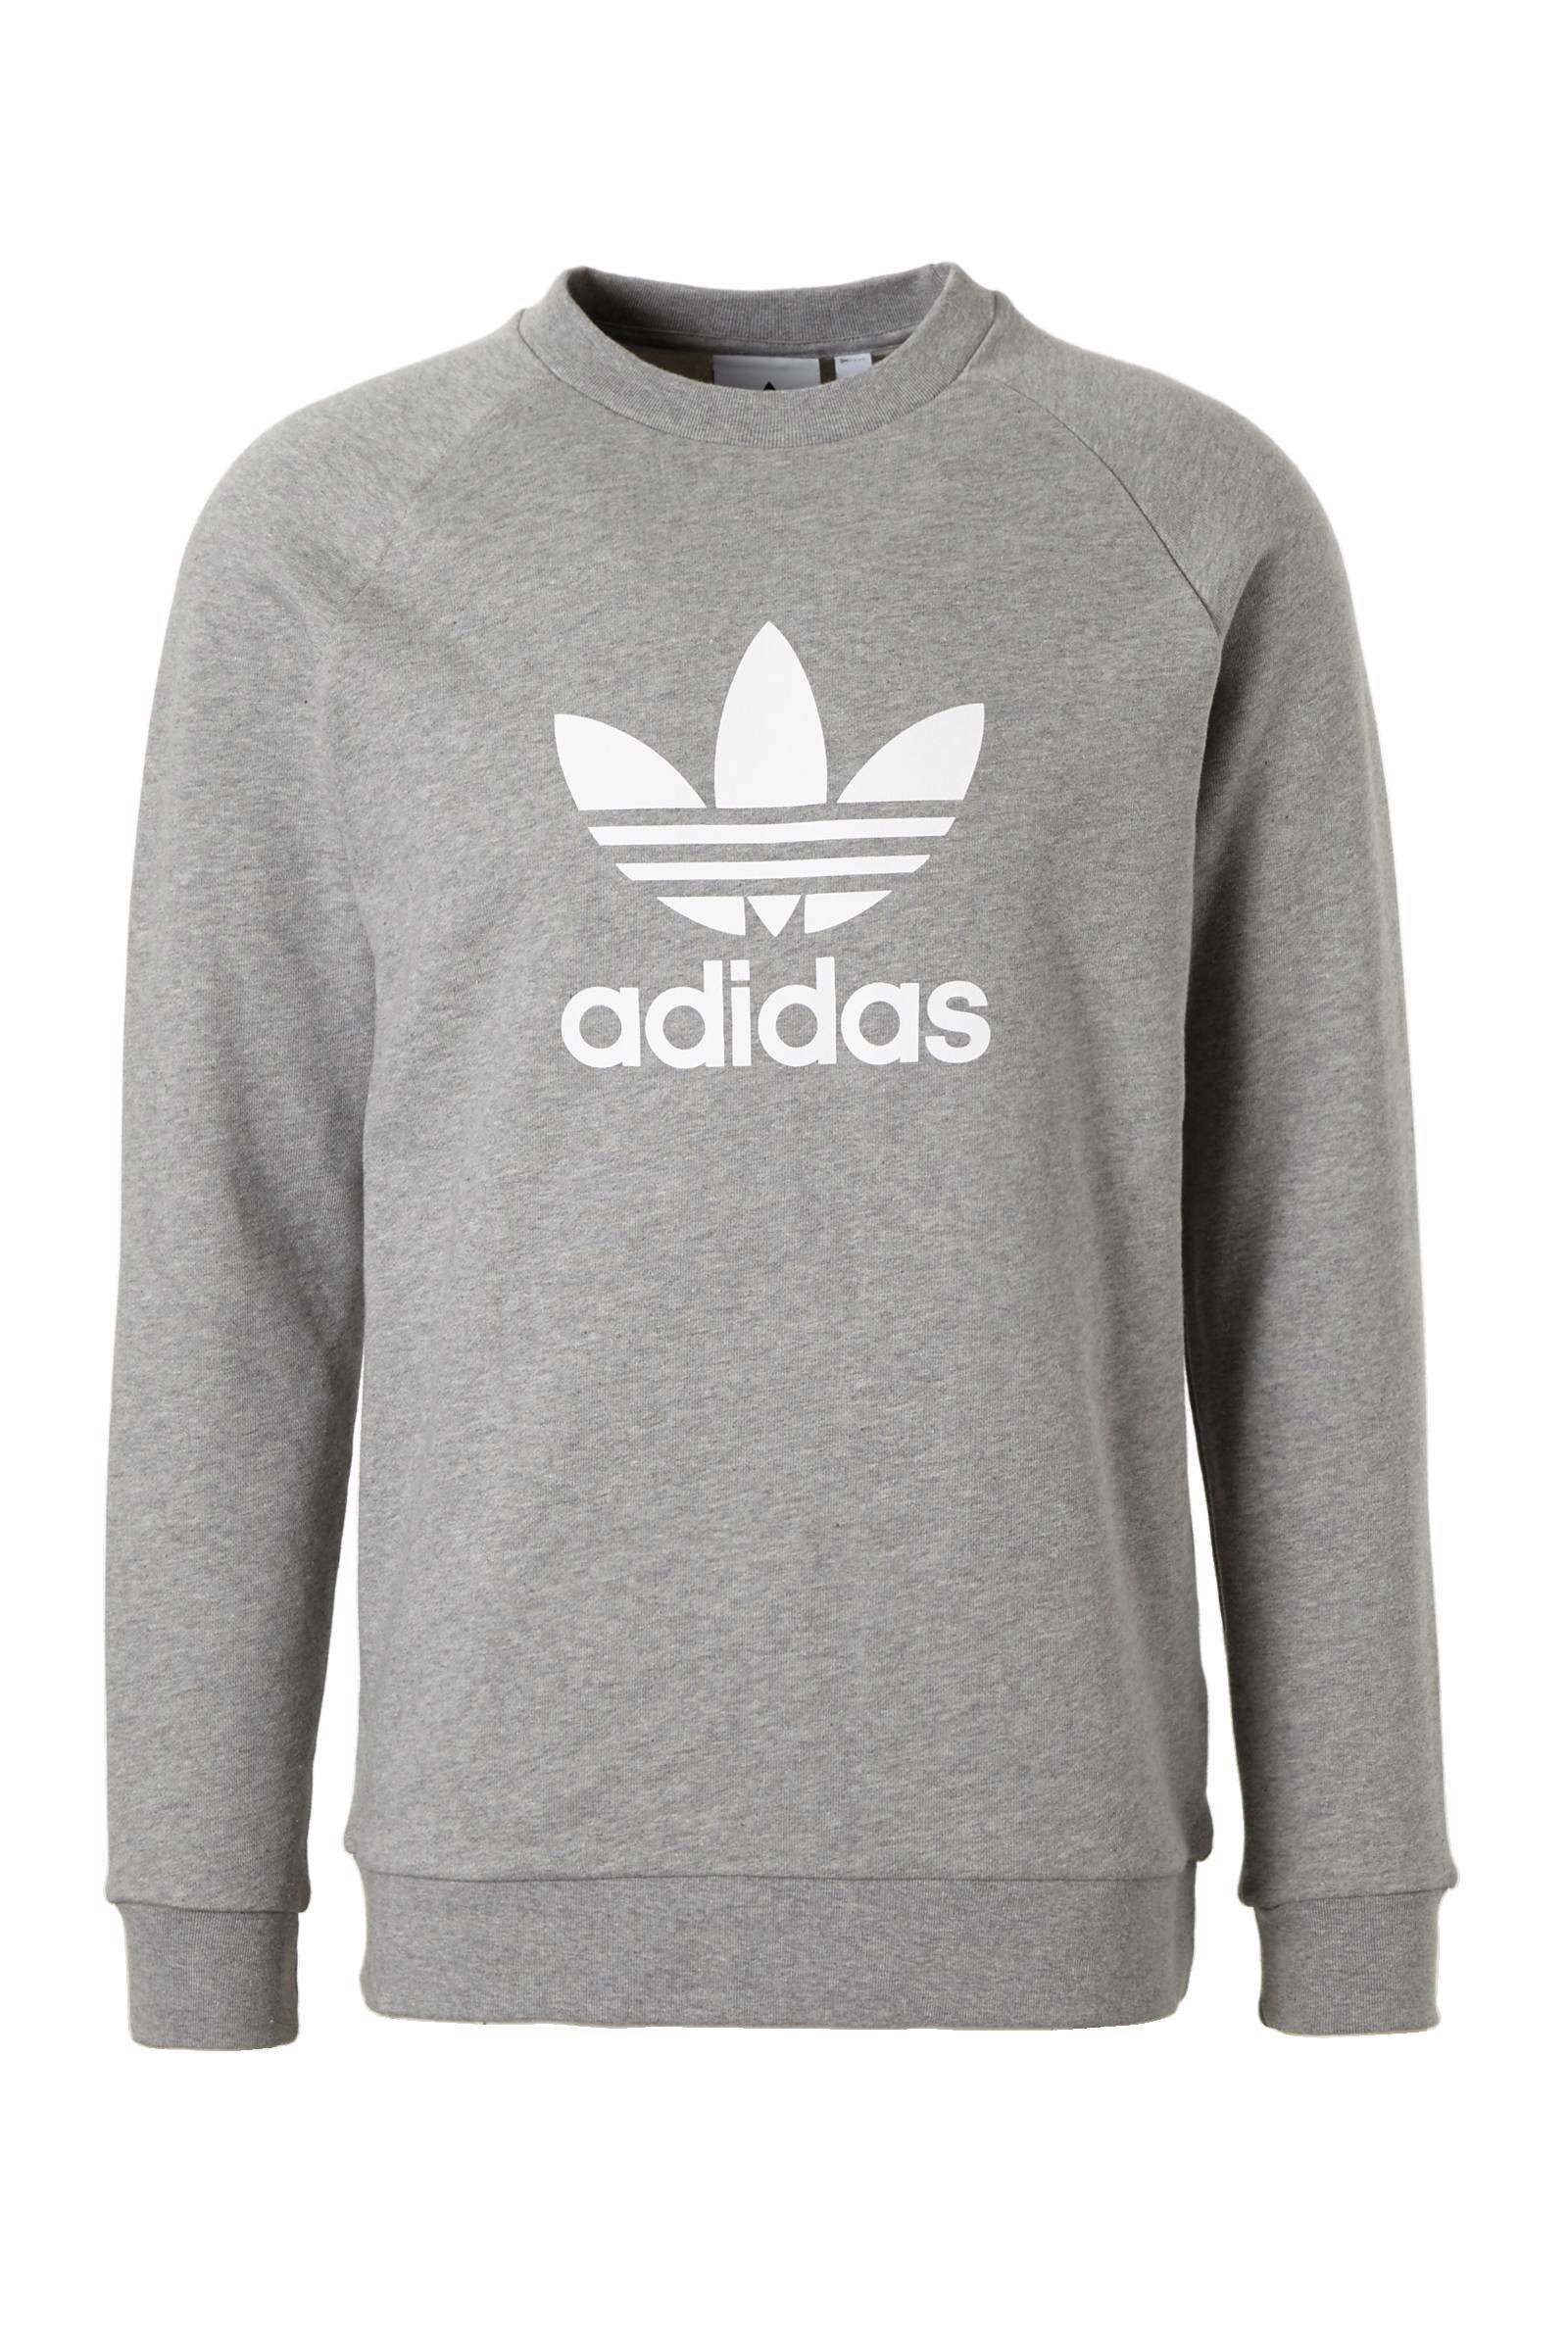 adidas sweater heren